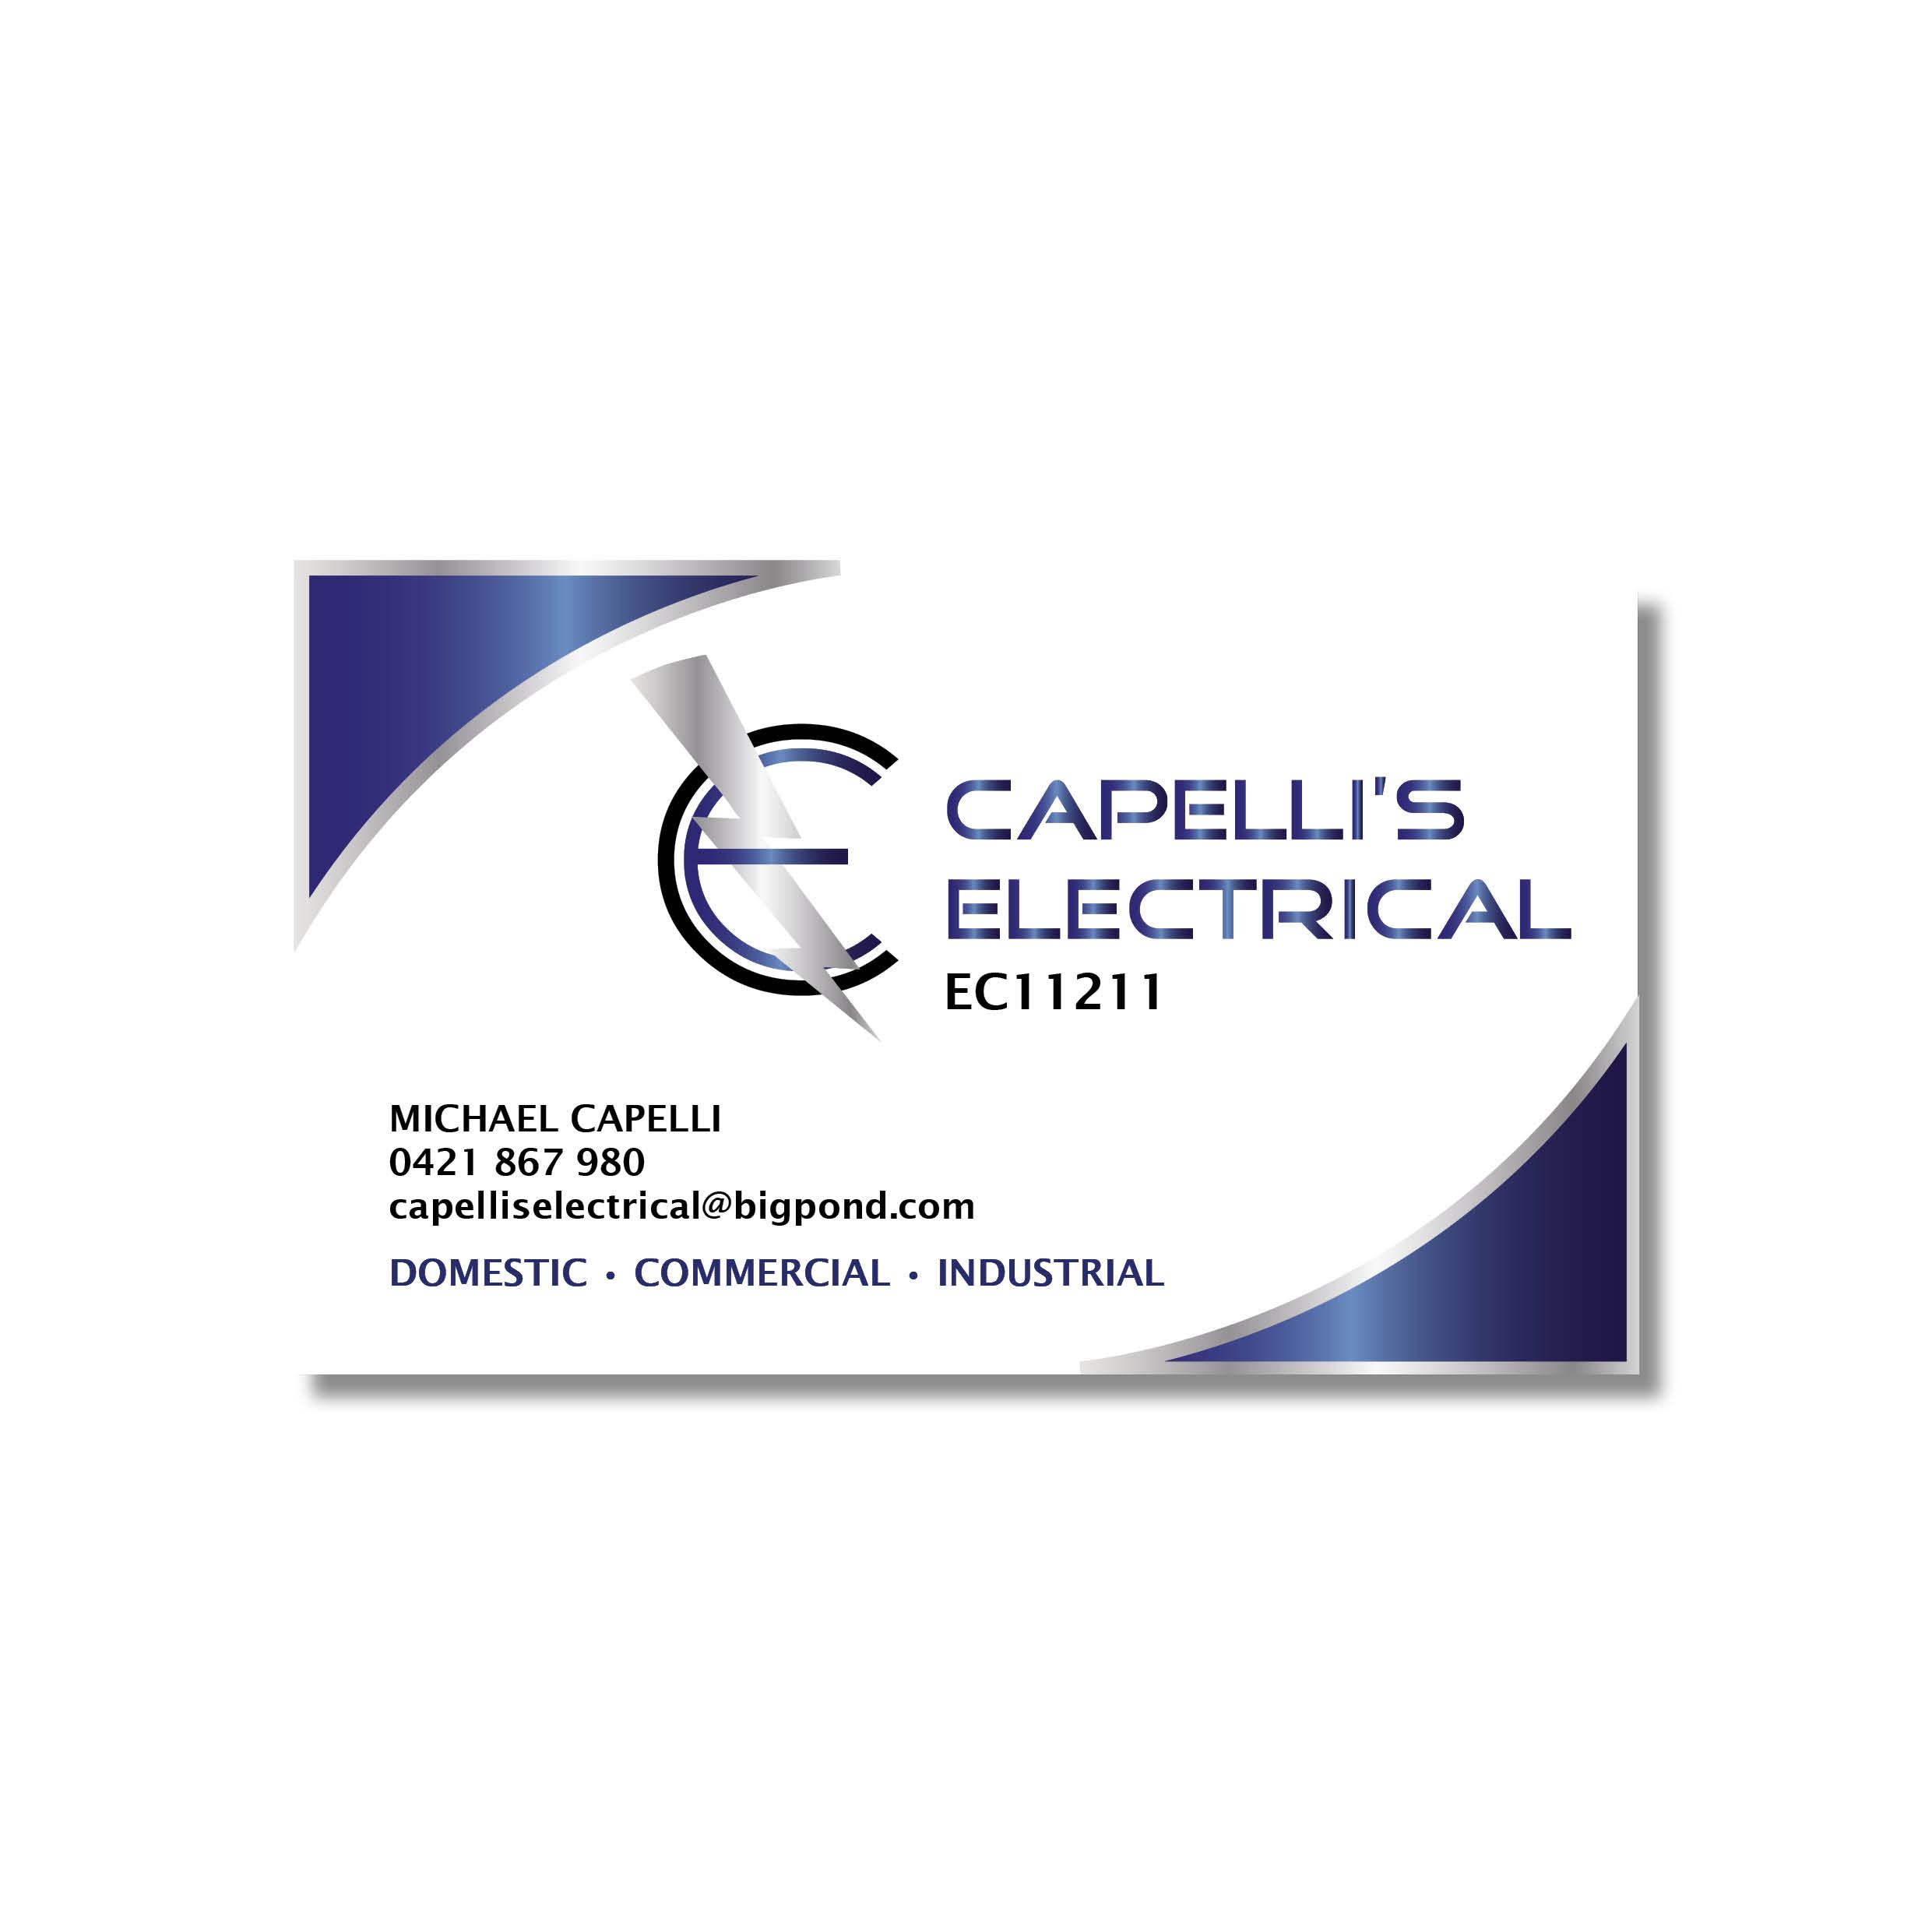 Capelli's Electrical.jpg